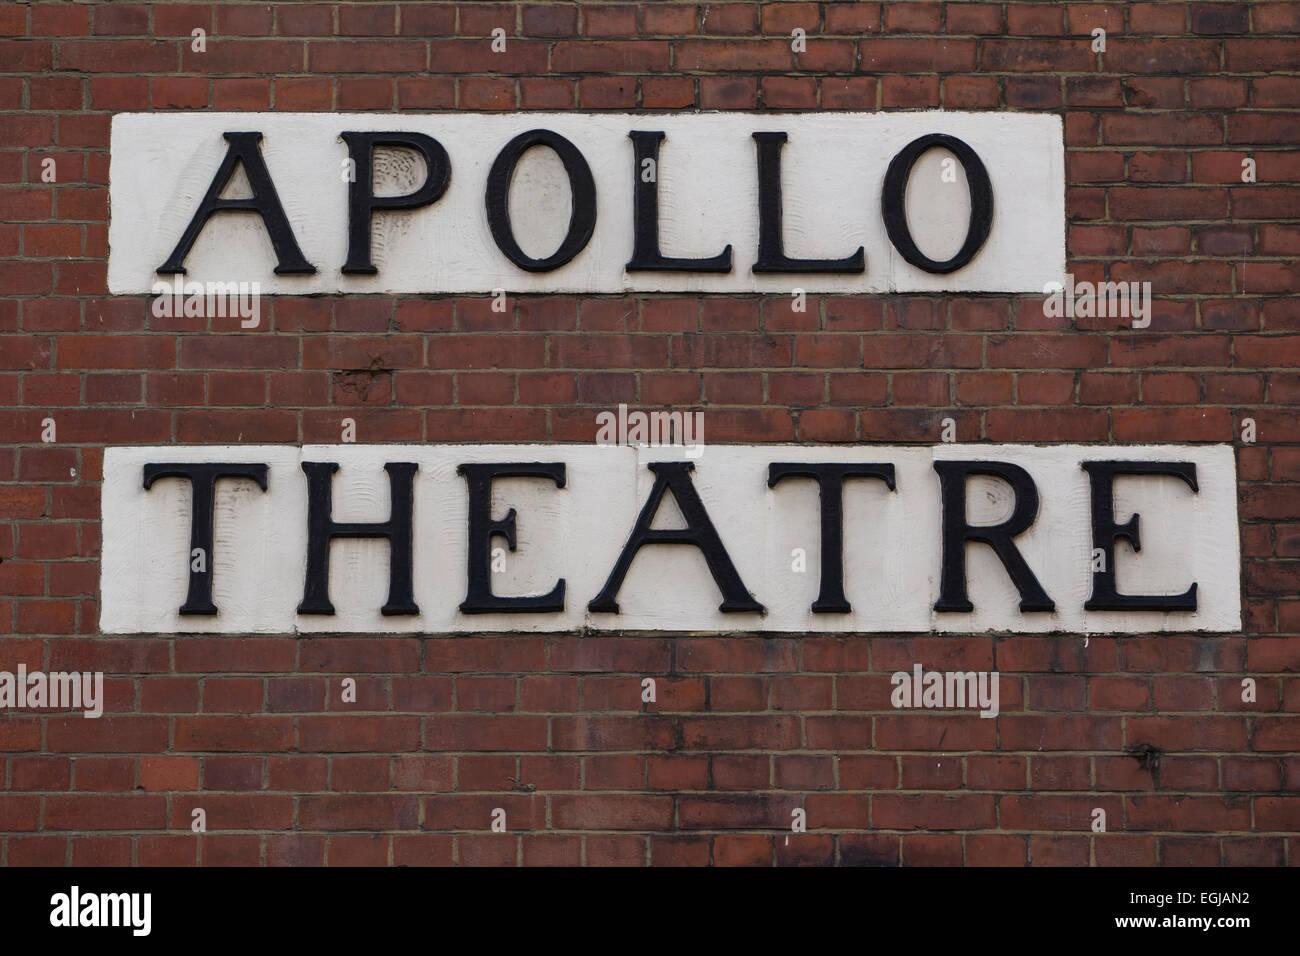 Apollo Theatre, Shaftesbury Avenue, Soho, London, England, UK - Stock Image